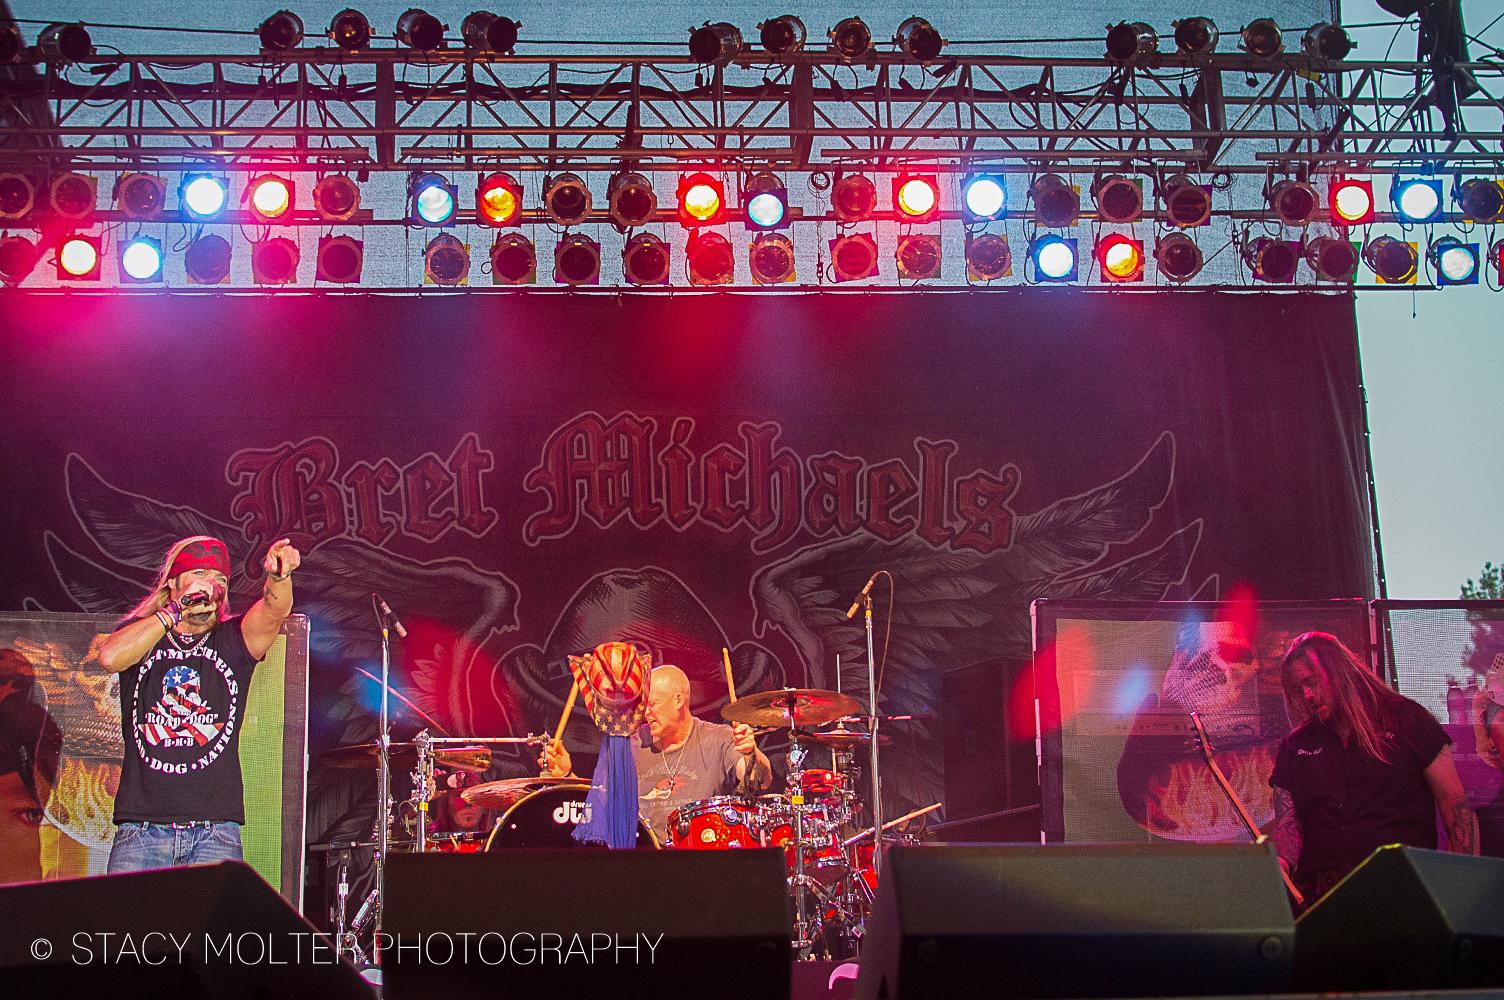 Bret Michaels - State Fair California 2014 #StateFairCA #ItsTheBest #TheBest